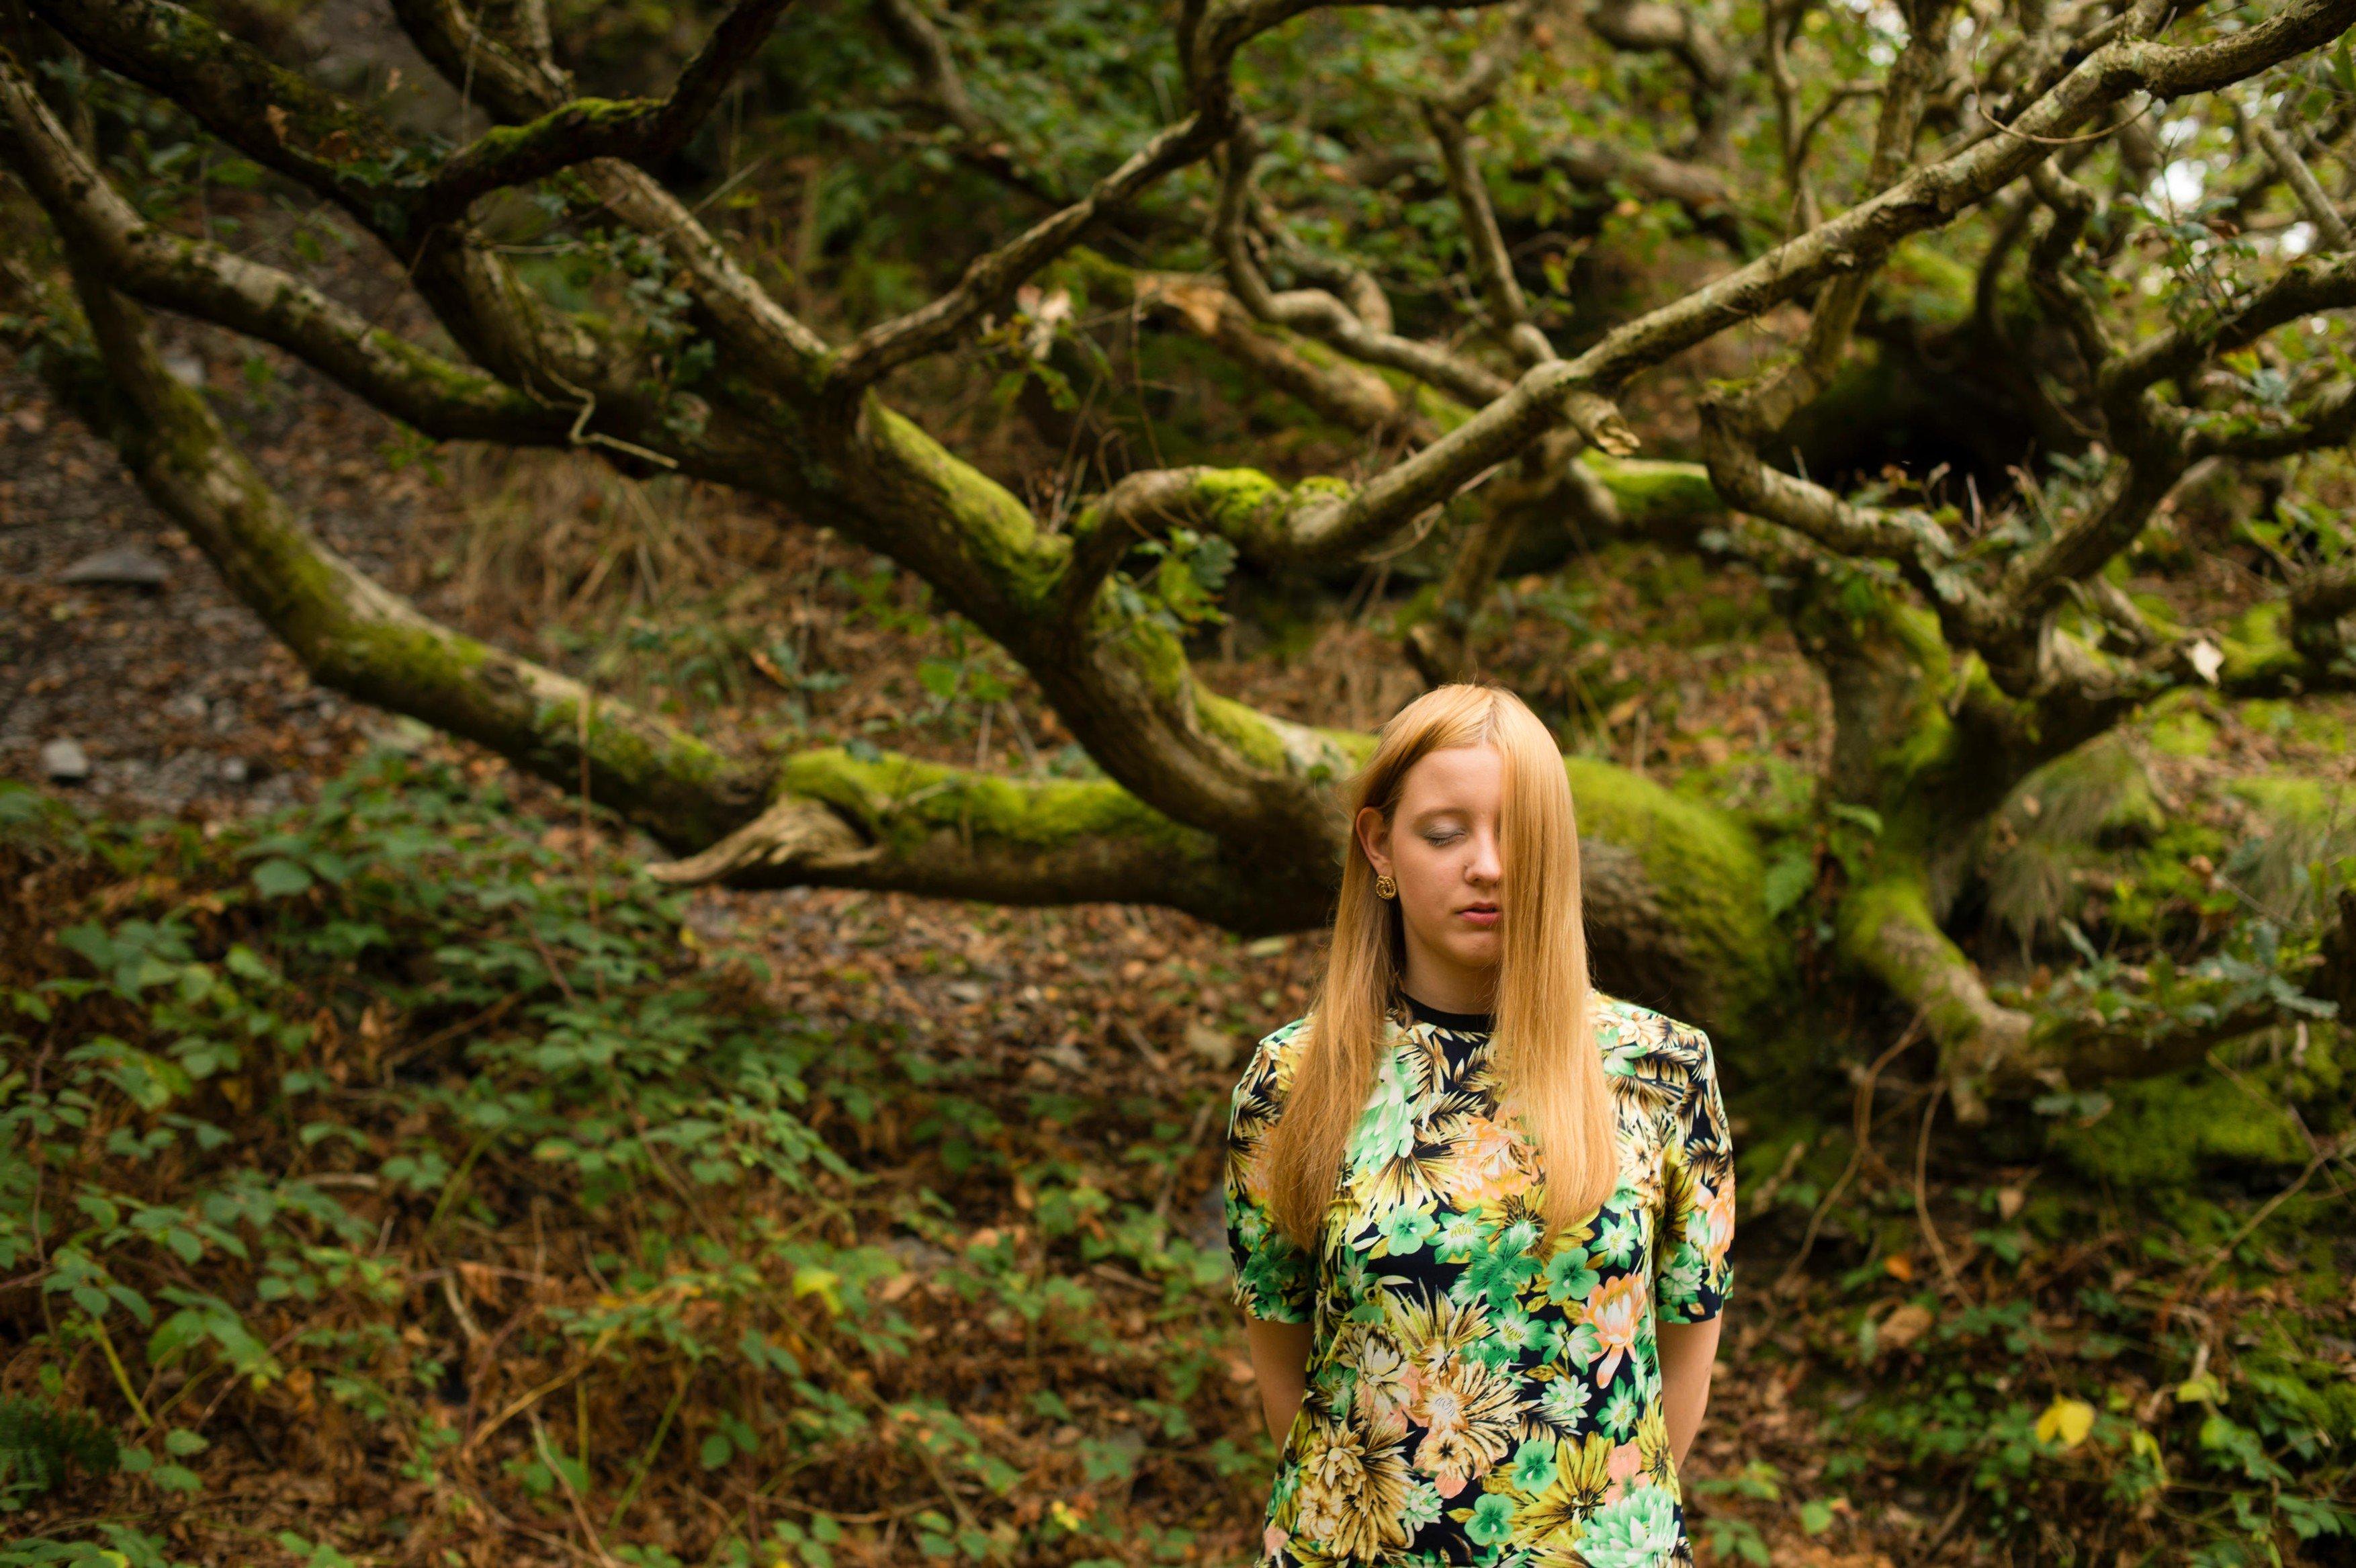 Stud - dívka - příroda - strom - mileniál